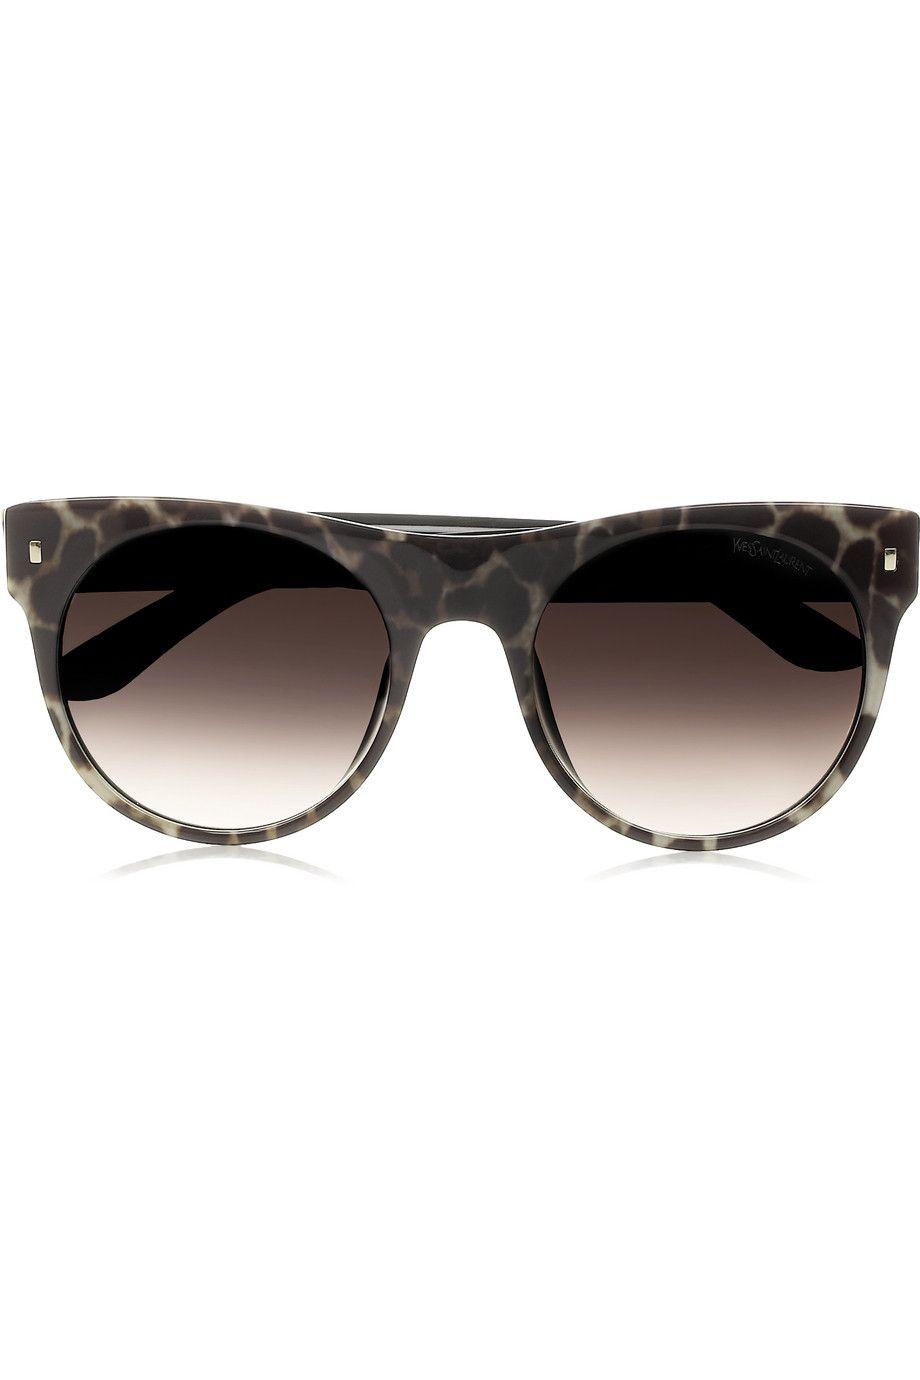 Yves Saint Laurent | Panther-print acetate D-frame sunglasses | NET ...